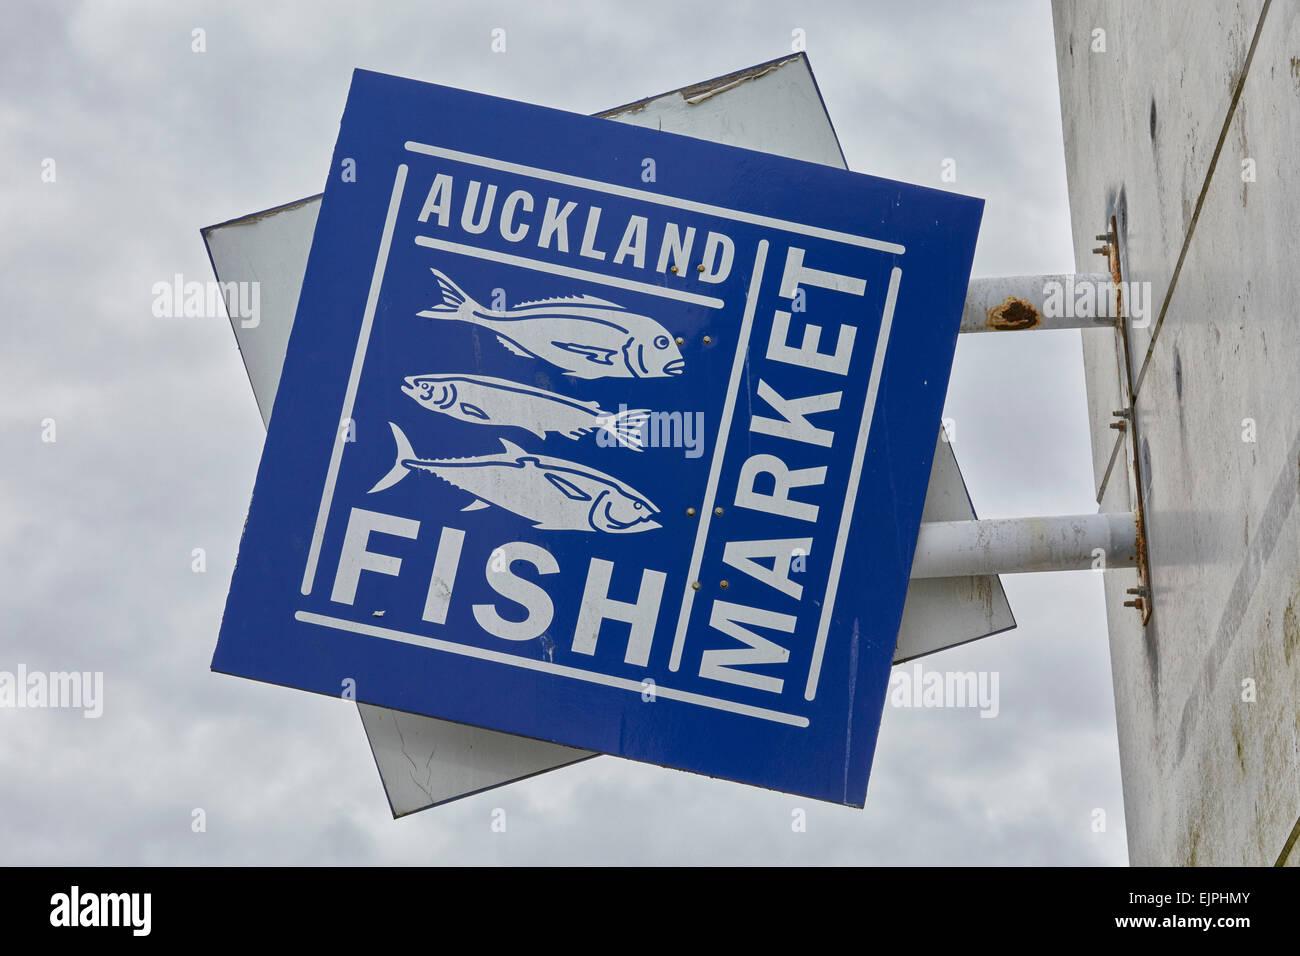 Auckland Fish Market sign, Auckland, North Island, New Zealand Stock Photo